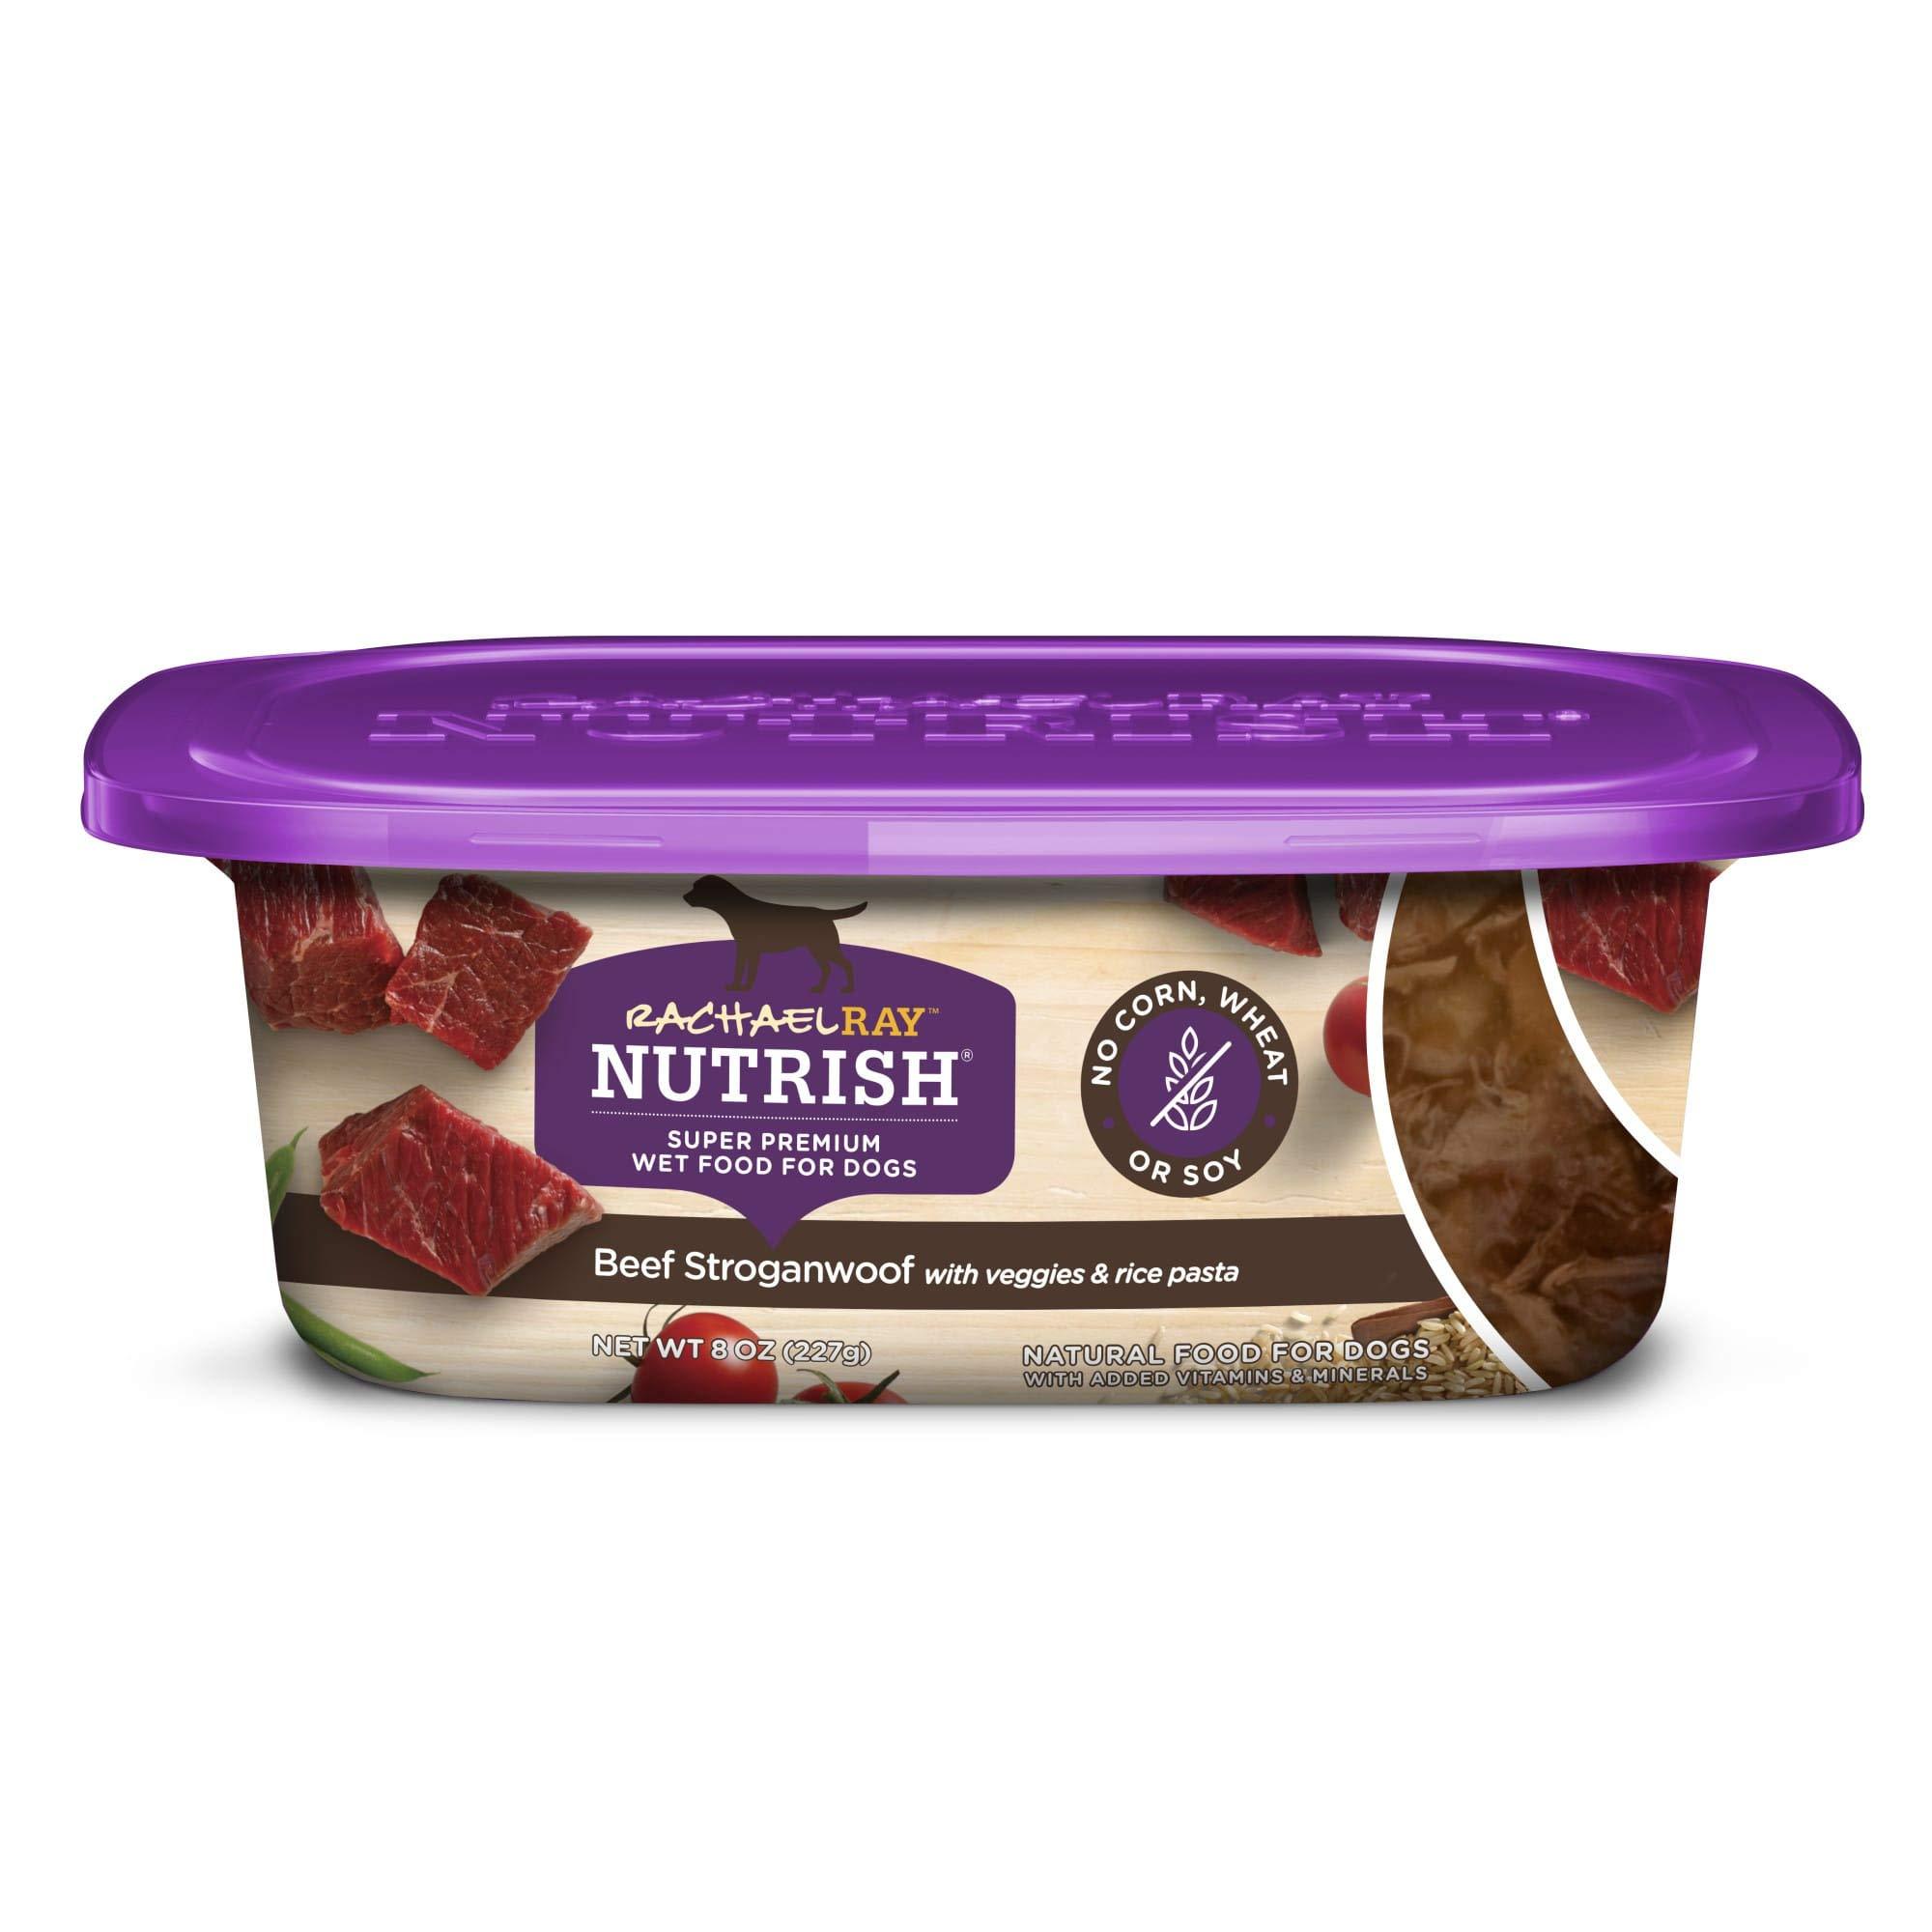 Rachael Ray Nutrish Premium Natural Wet Dog Food, 8 Ounce Tubs